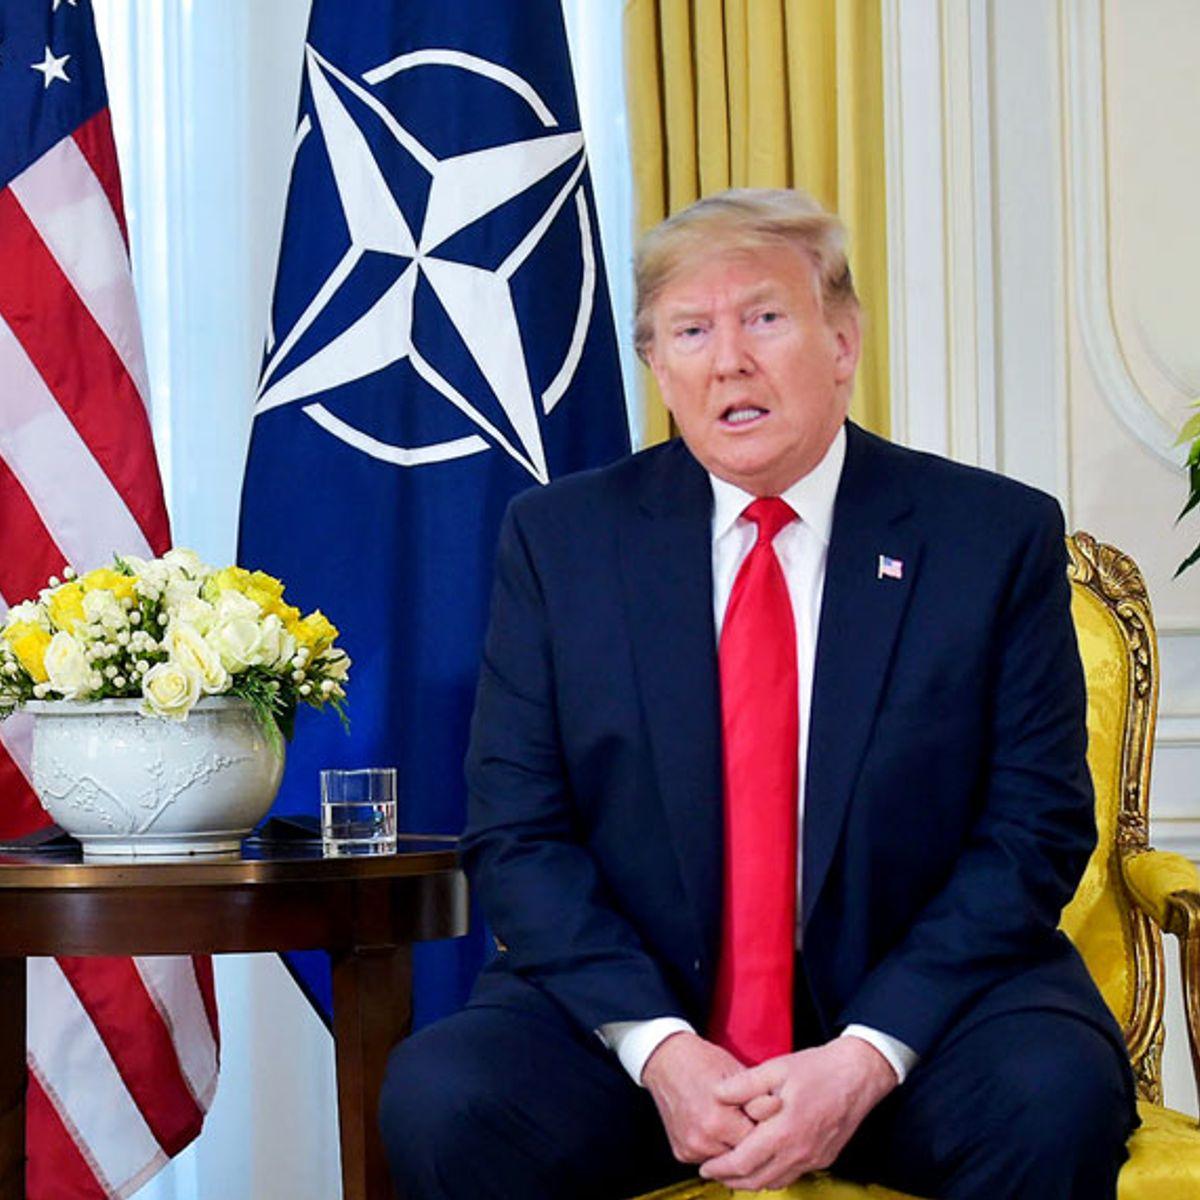 World mocks Trump at NATO summit: Impeachment has him coming unglued